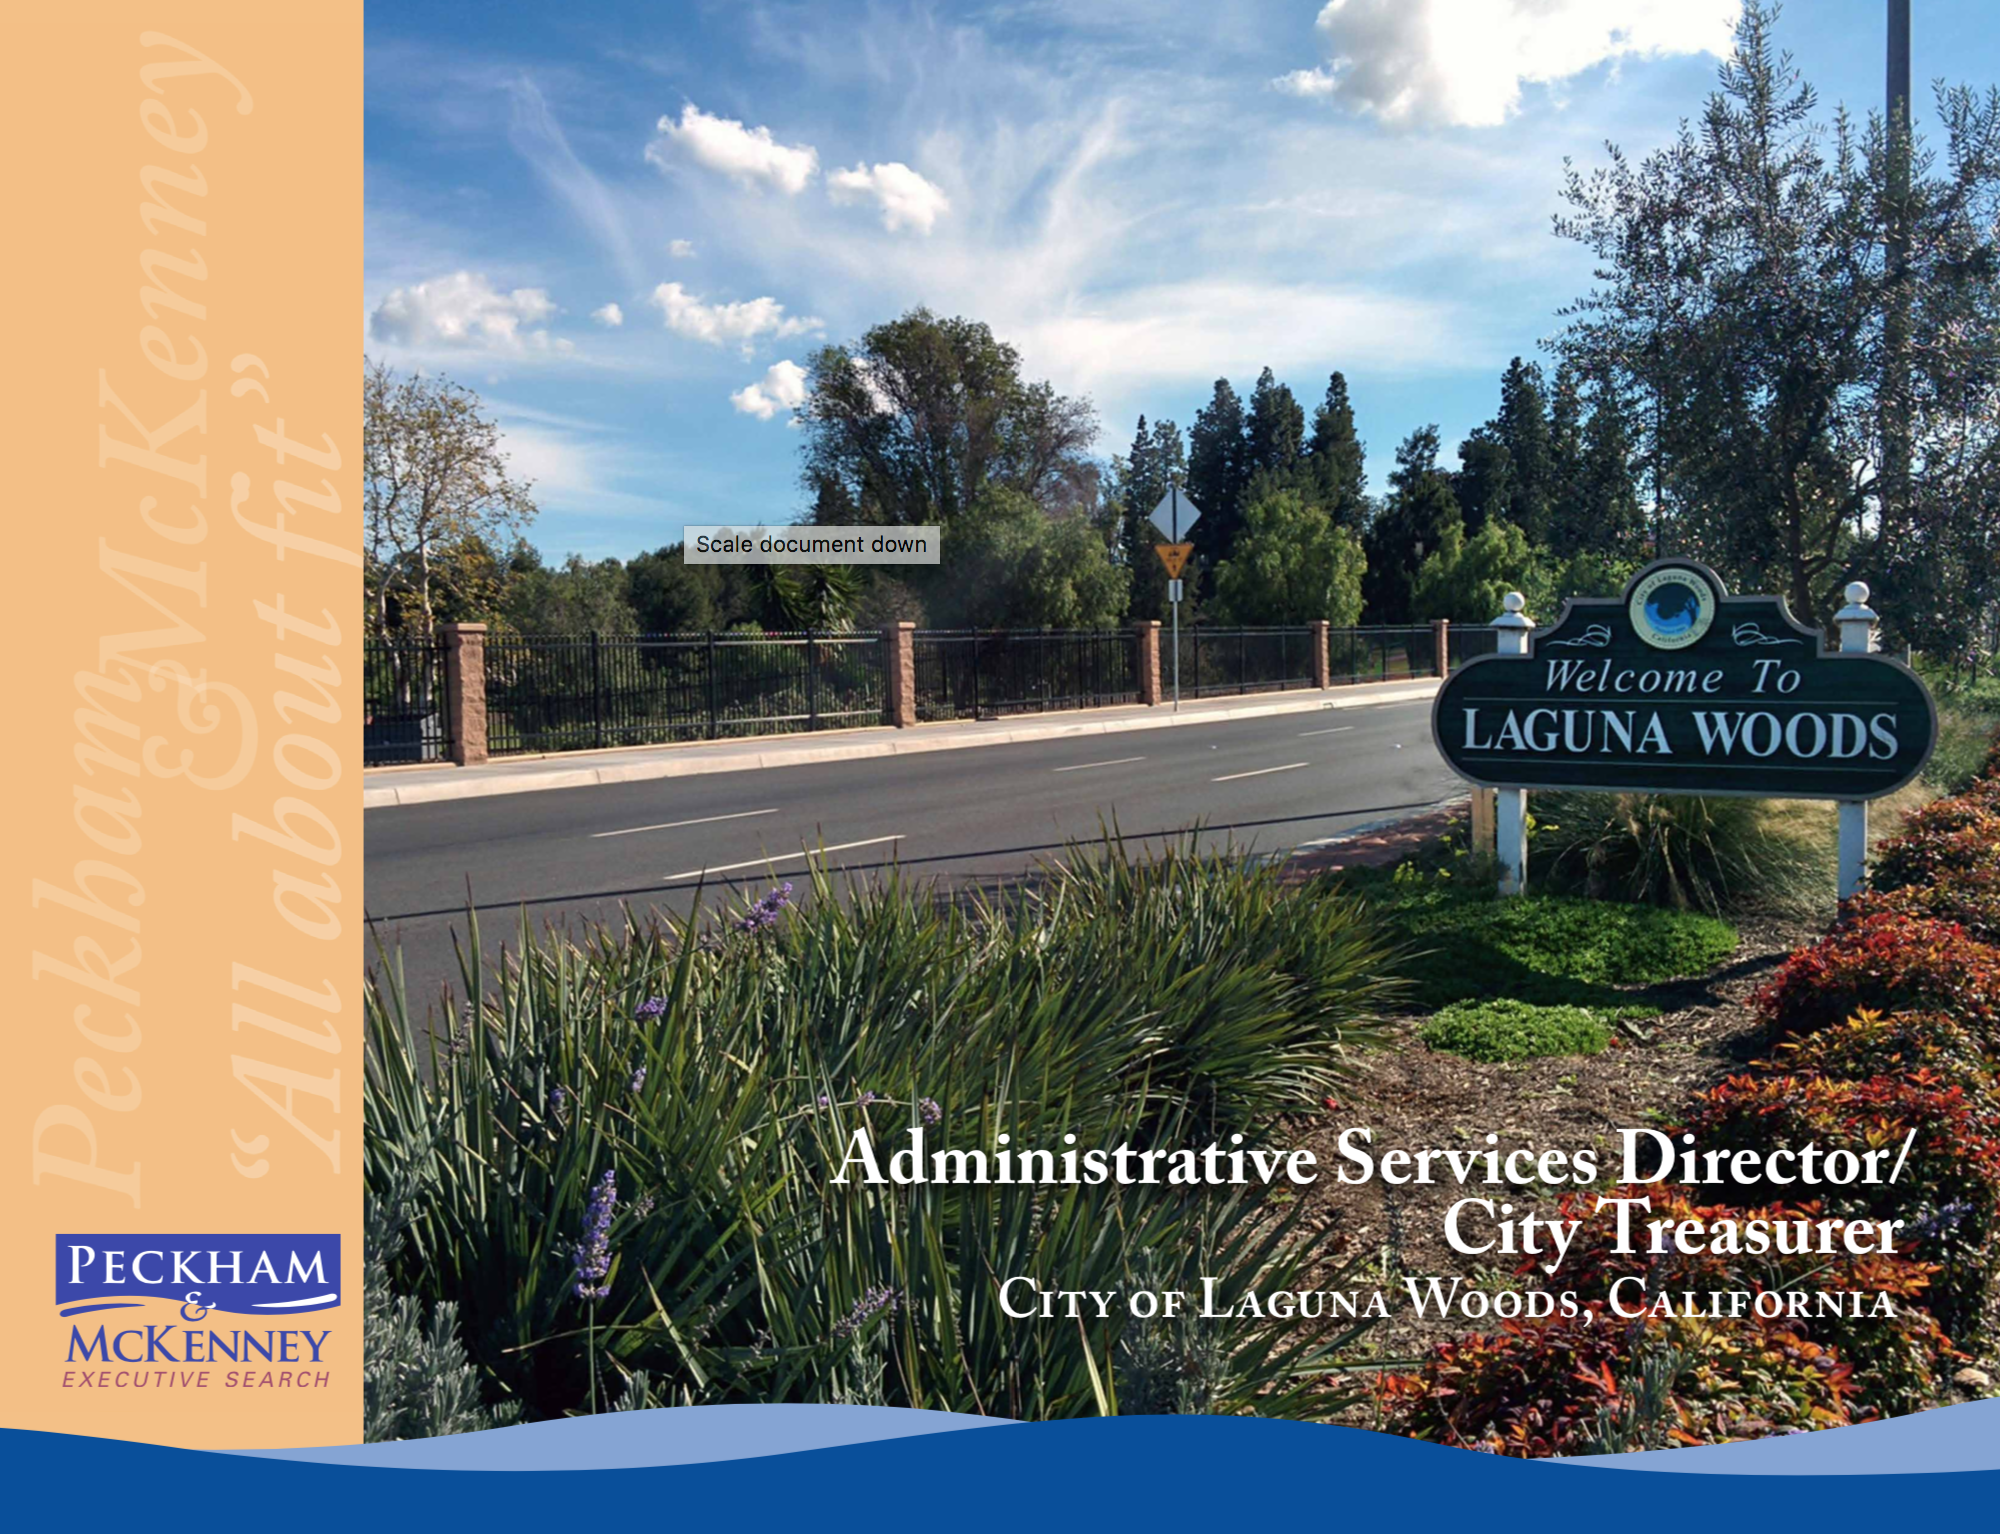 Administrative Services Director City Treasurer_LagunaWoodsCa